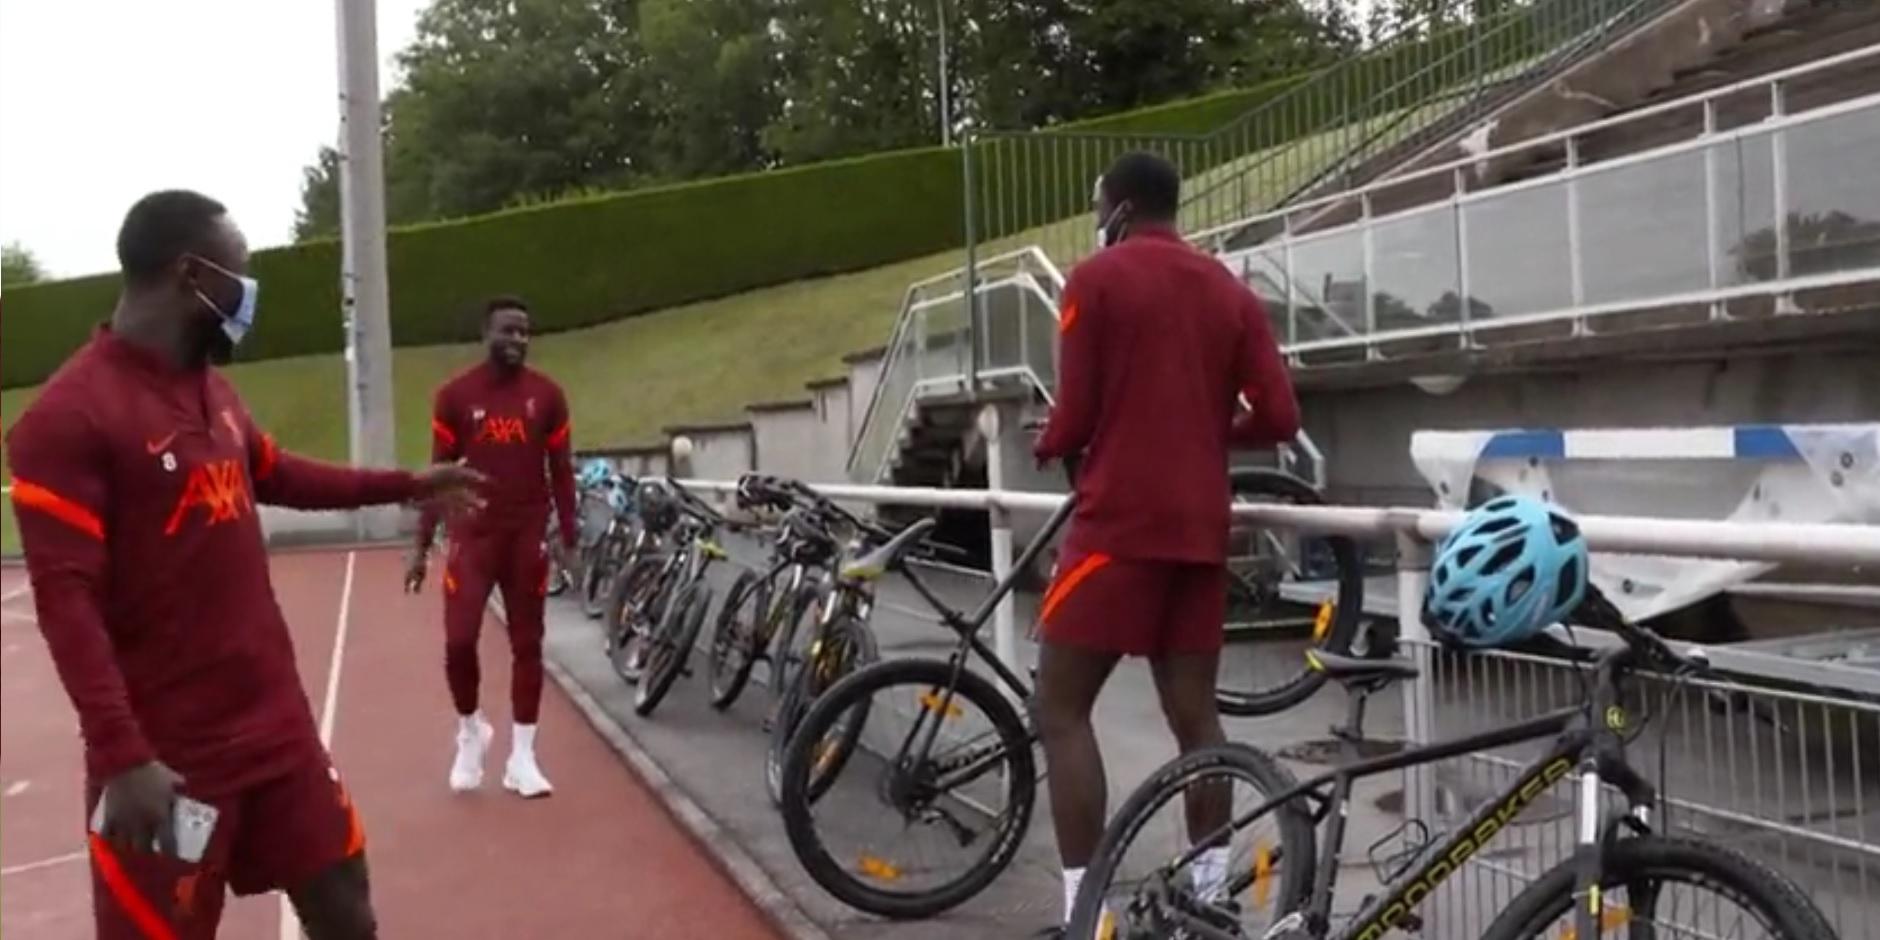 (Video) Keita & Origi mock Konate for how he locks up his bike at Liverpool training camp